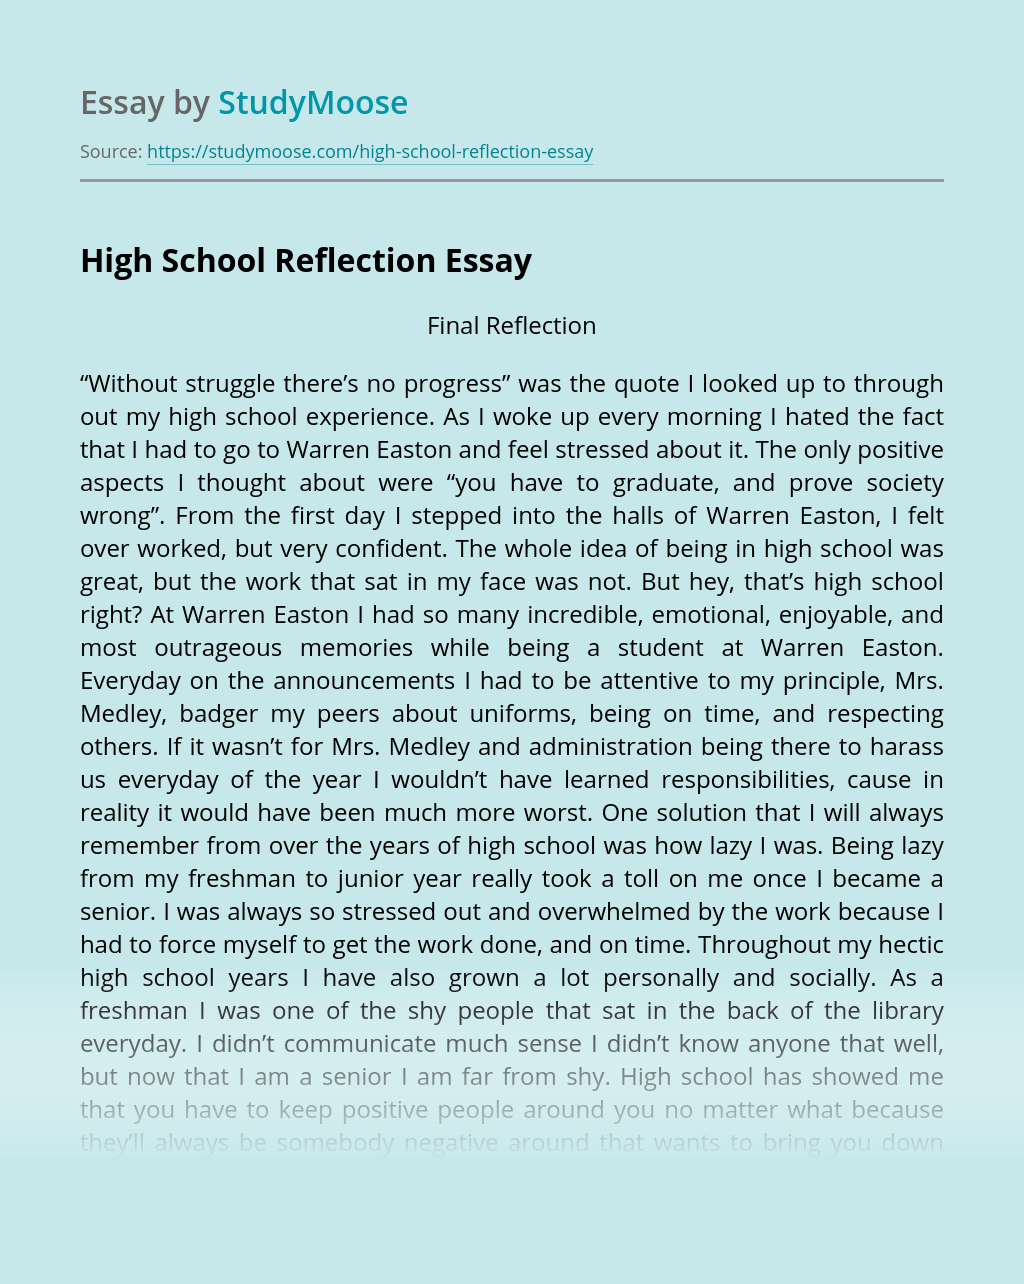 High School Reflection